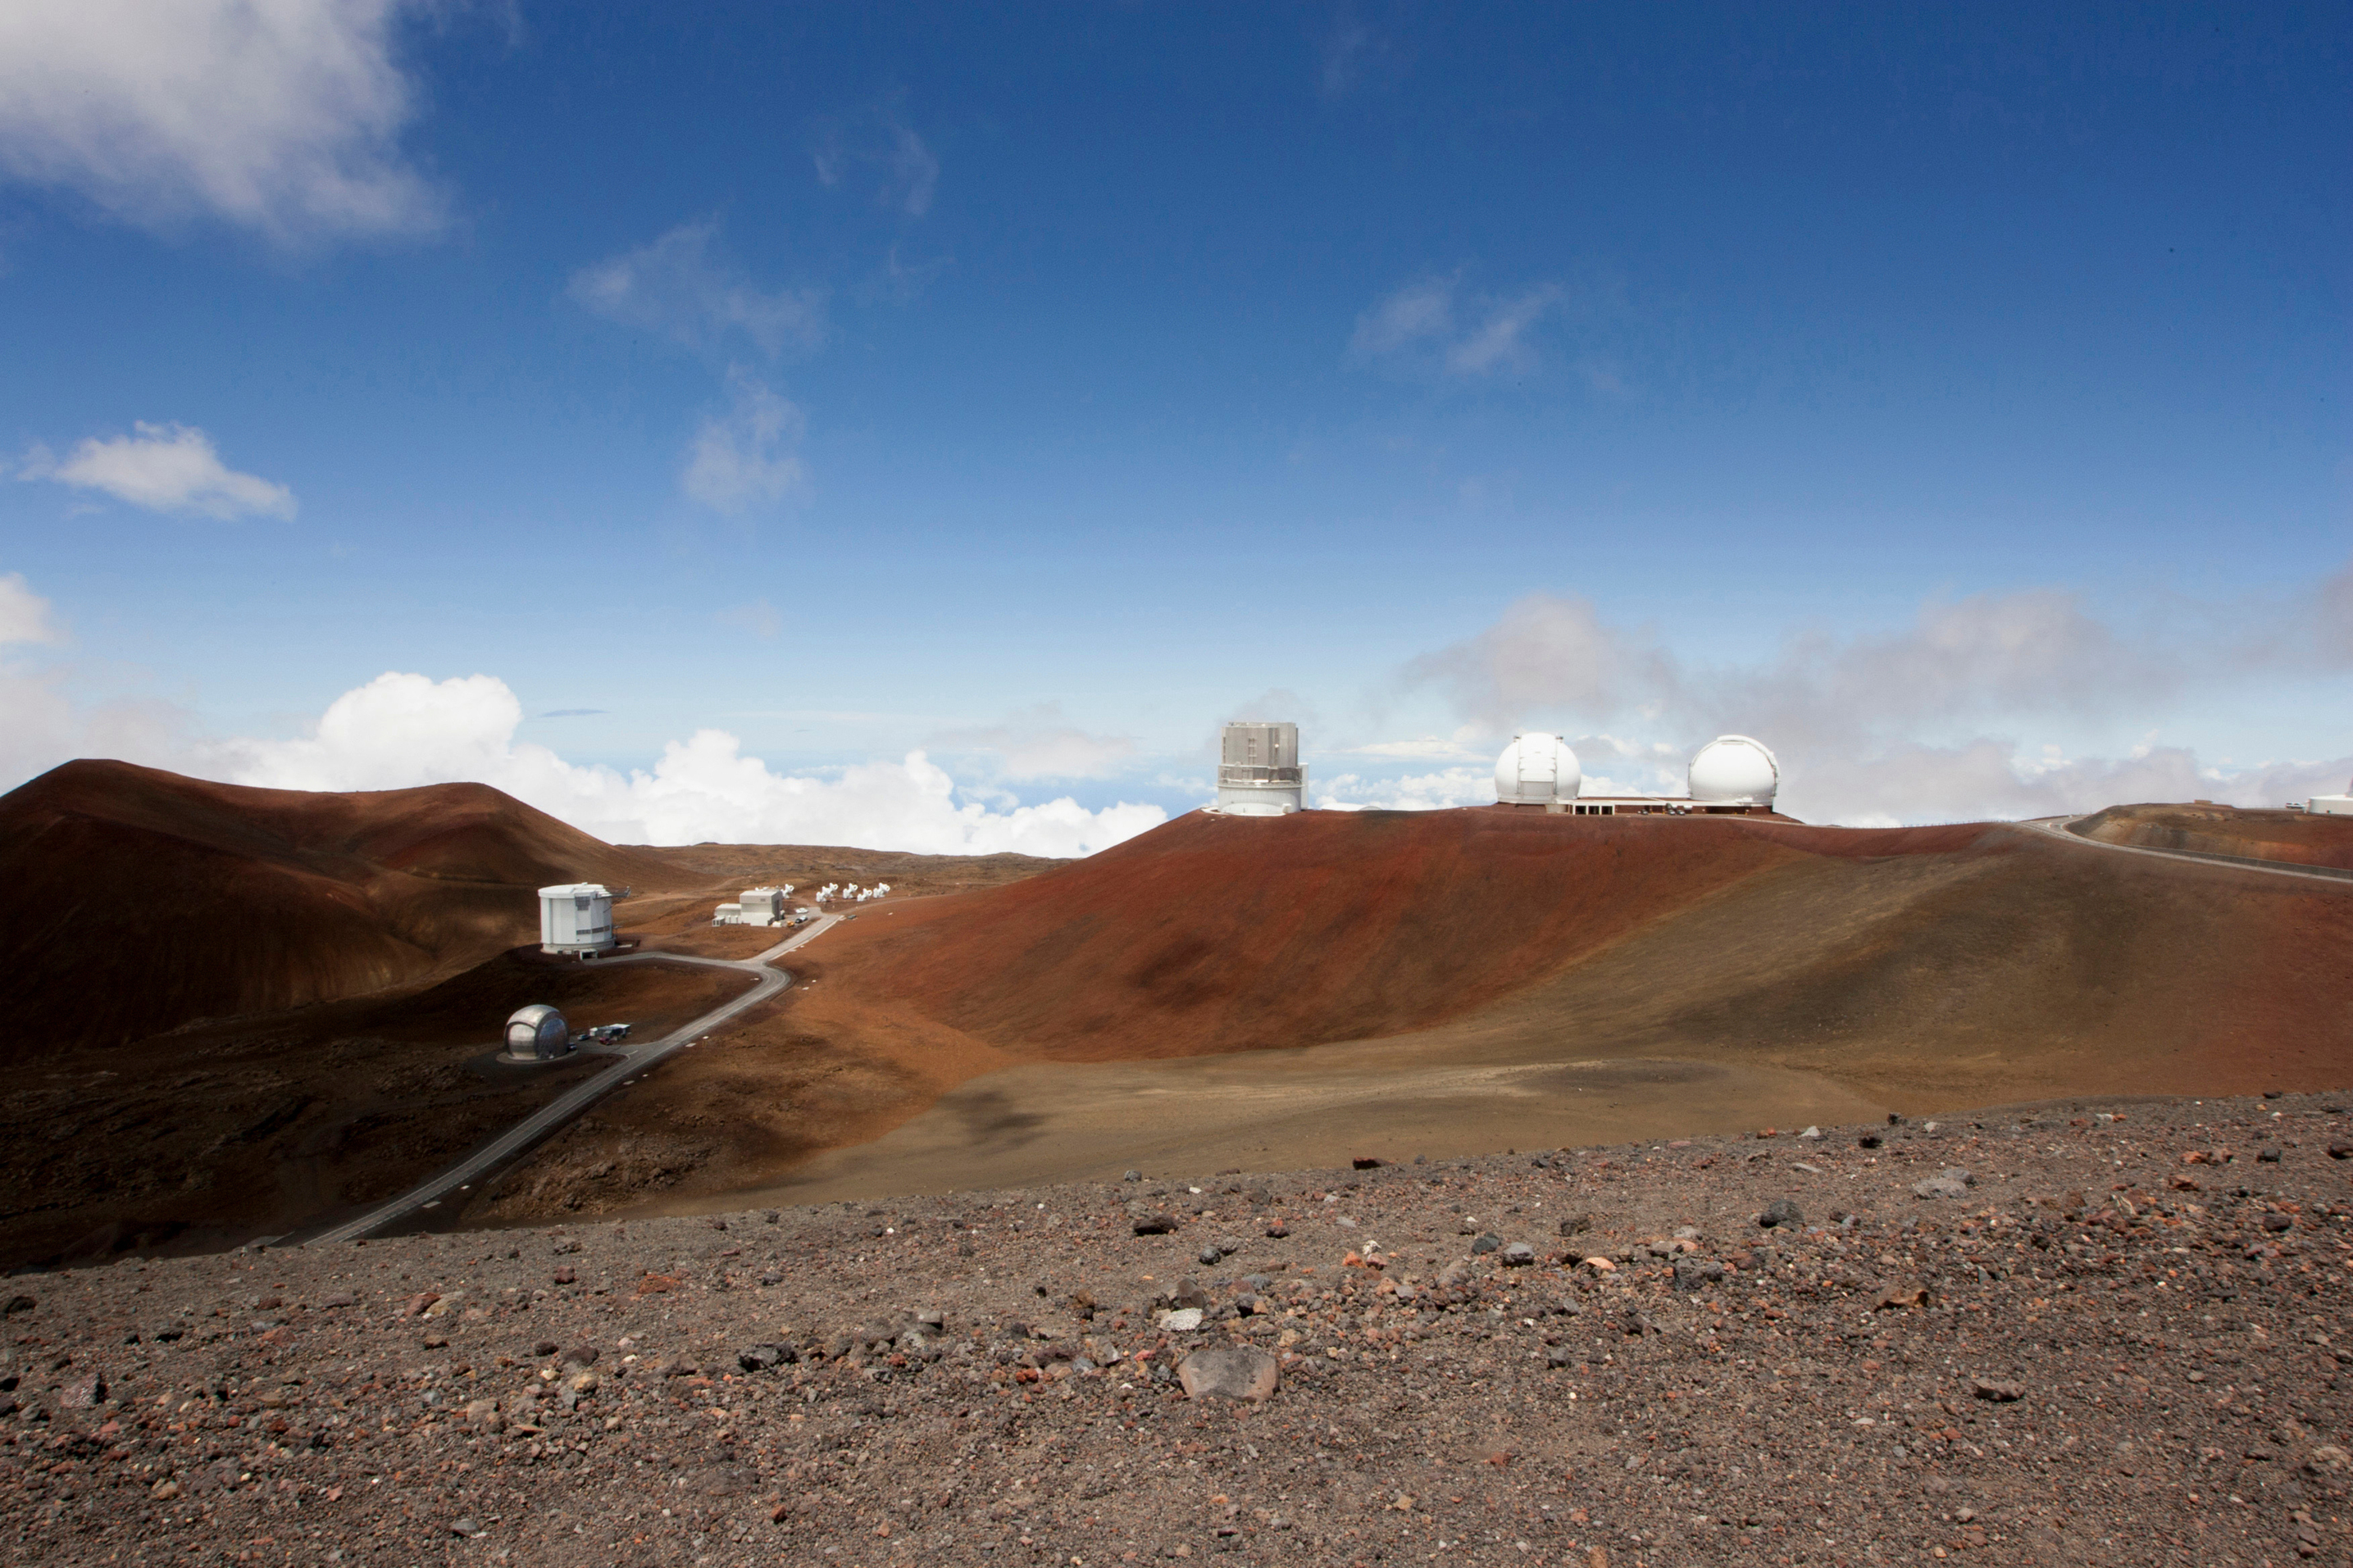 Hawaiian activists prepare for Mauna Kea telescope convoys